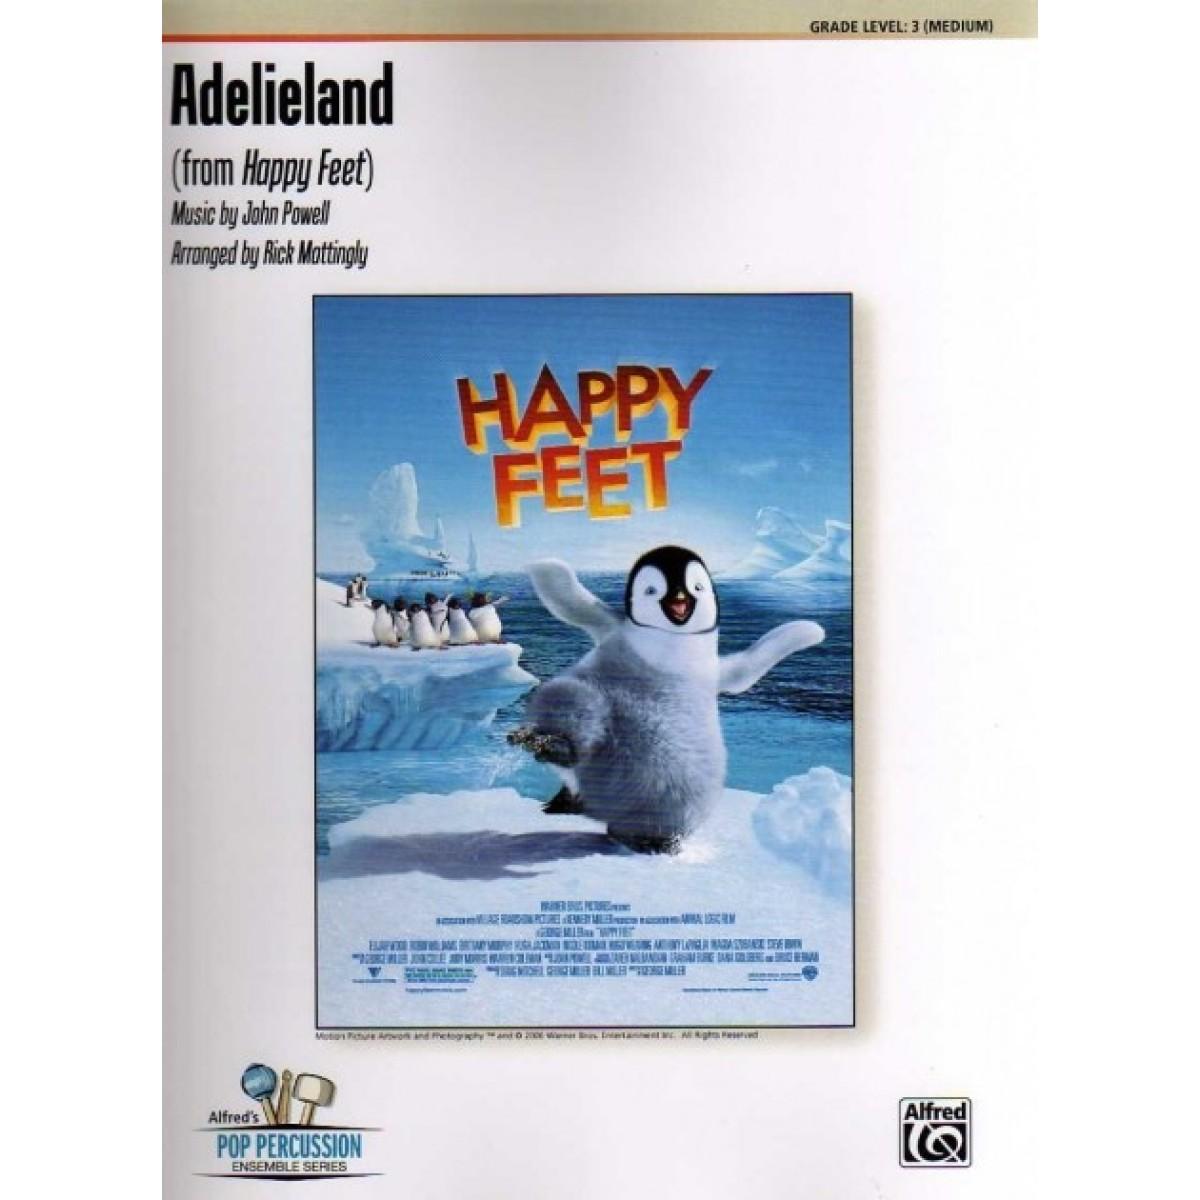 Adelieland from Happy Feet